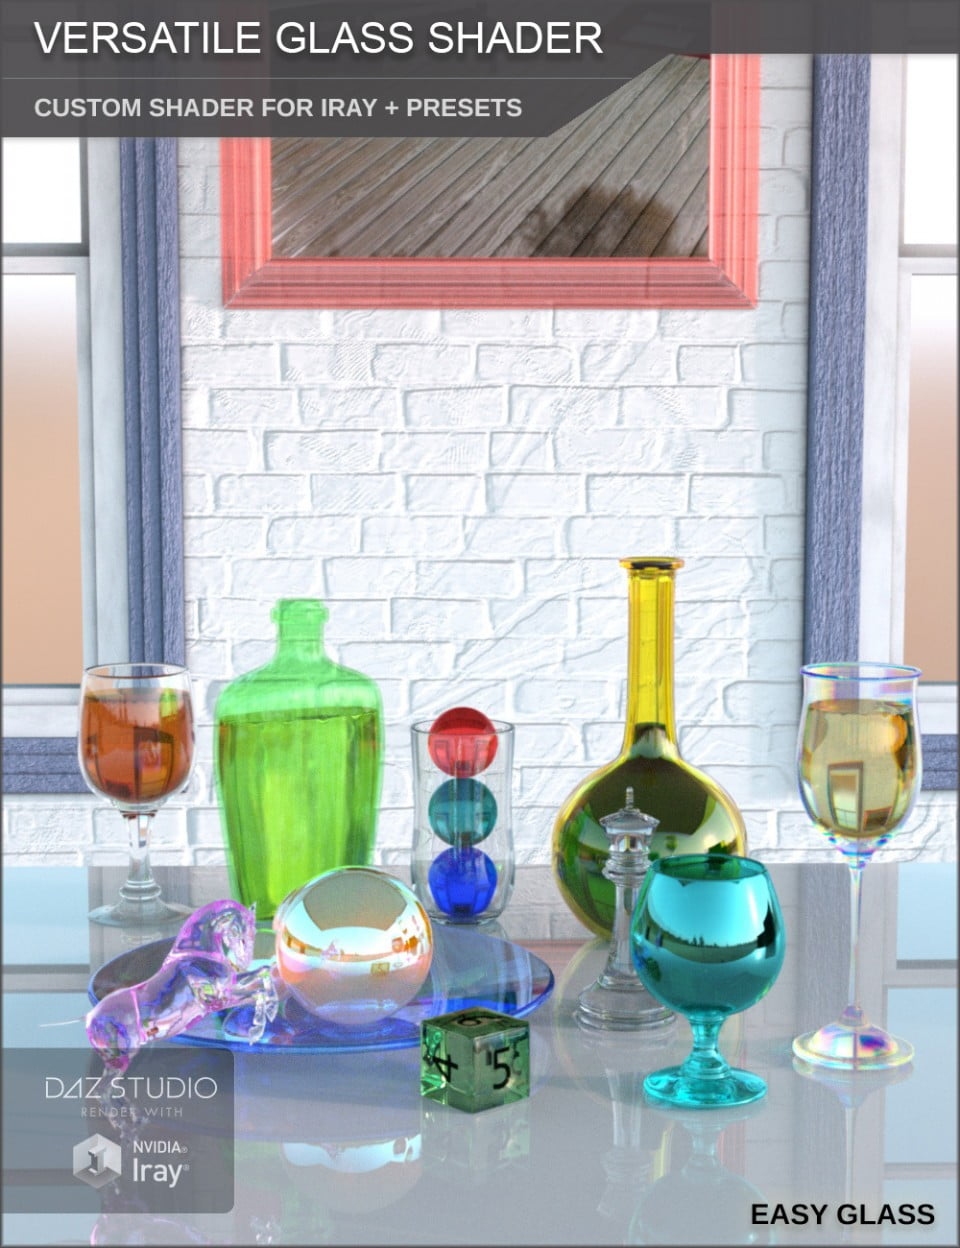 Versatile Glass Shader - Custom Shader and Presets for Iray